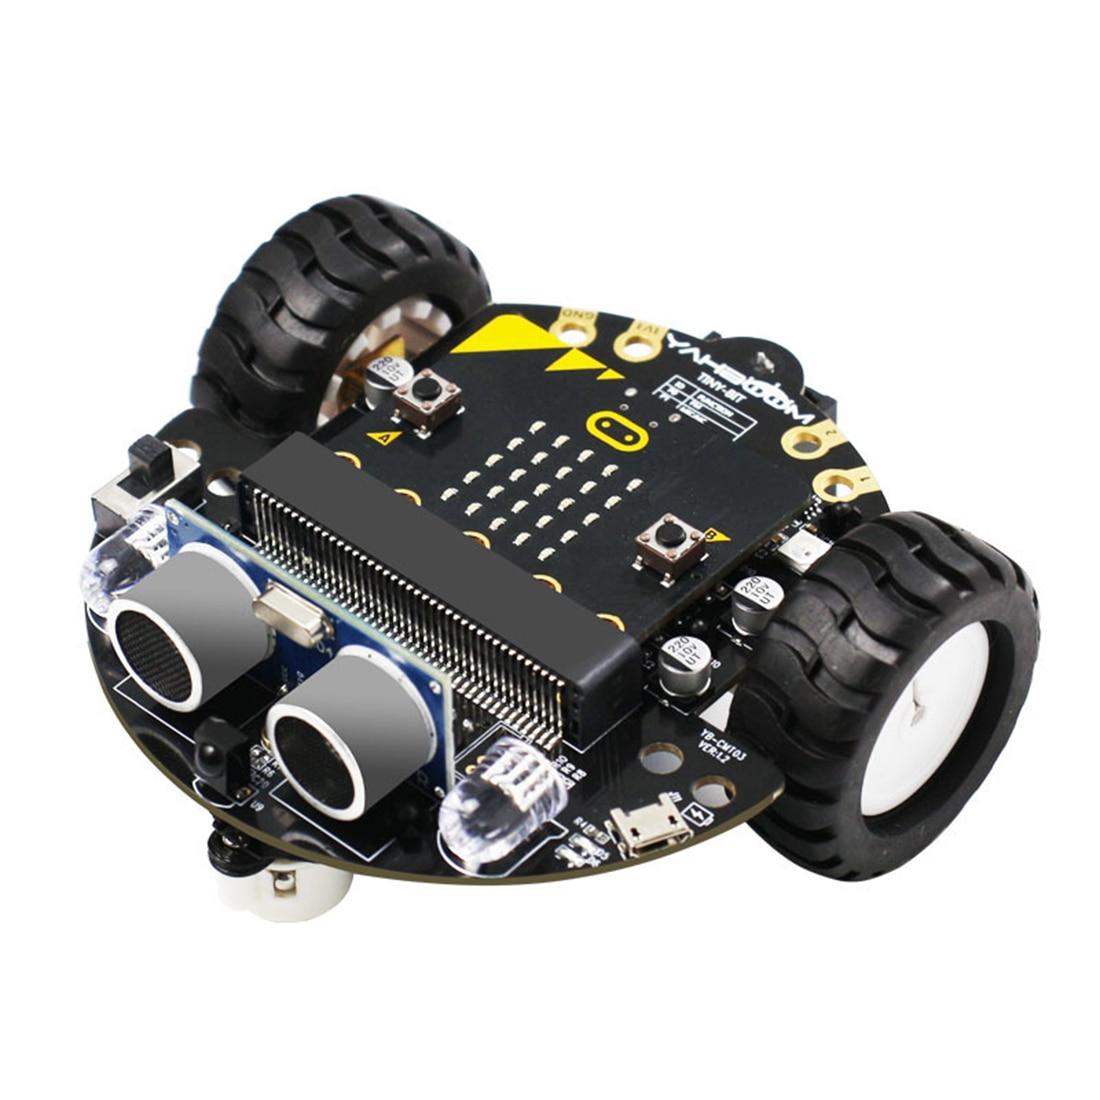 diy evitar obstaculos inteligente programavel robo carro brinquedo educacional aprendizagem kit sem com mainboard para micro